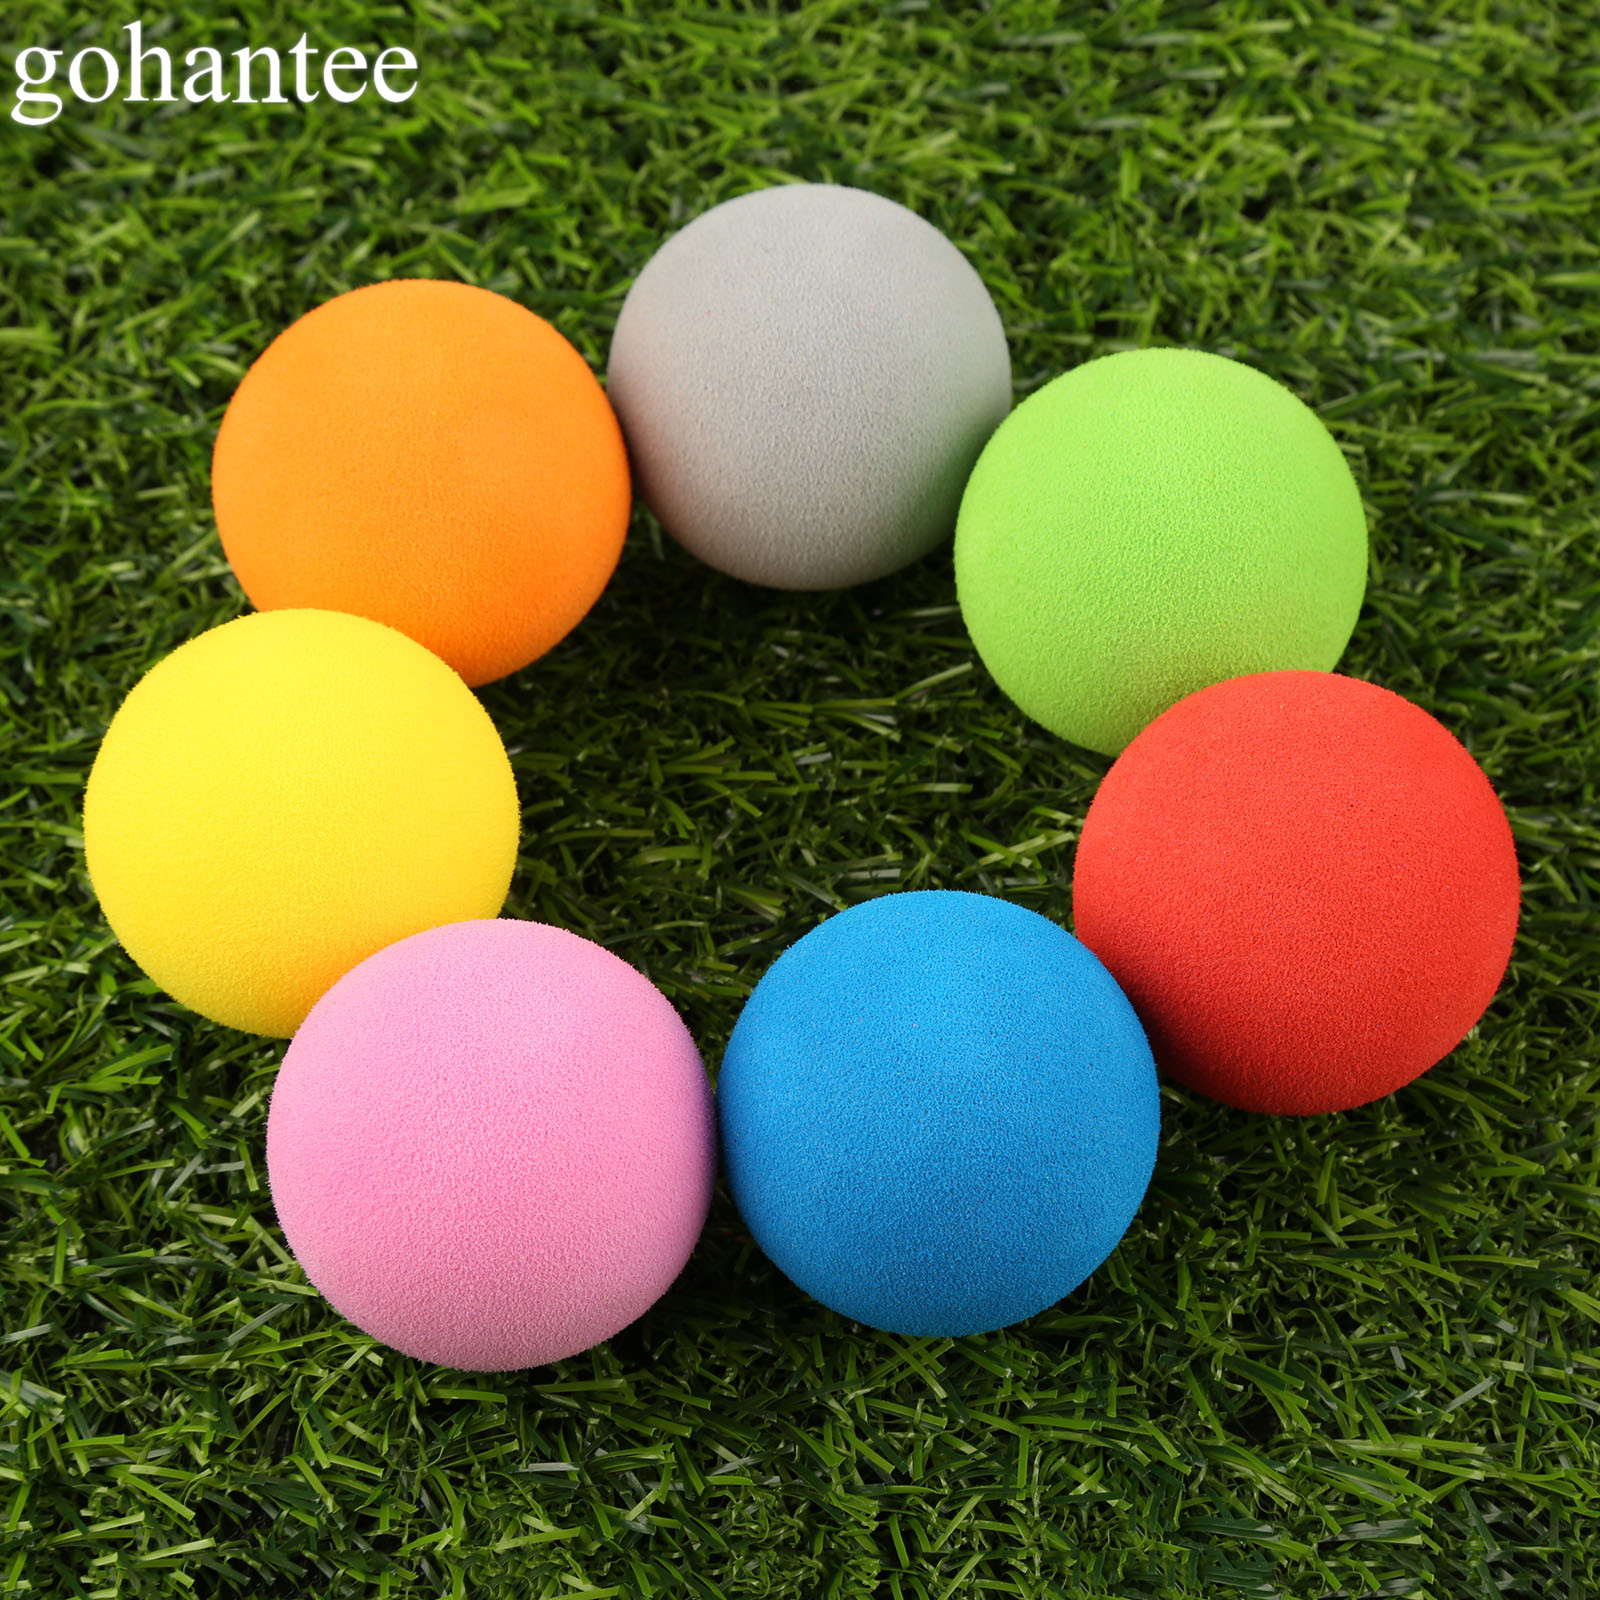 20pcs EVA Foam Golf Balls Soft Sponge Golf Monochrome Balls for Outdoor Golf Practice Balls for Golf/Tennis Training Solid Color caiton 12pcs pack three four five layer golf balls golf standard game balls